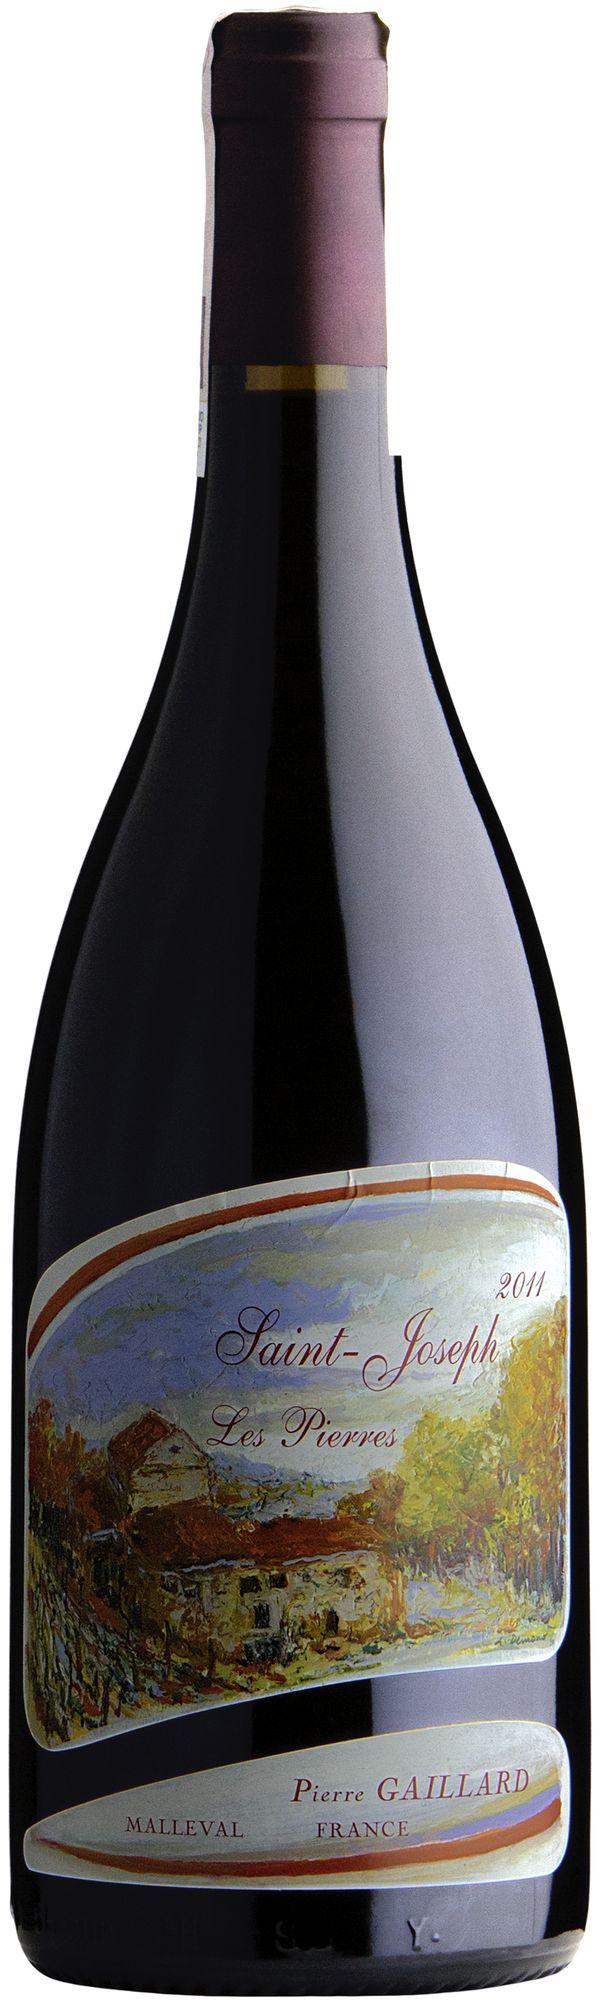 Wino Gaillard Les Pierres Saint Joseph AOC